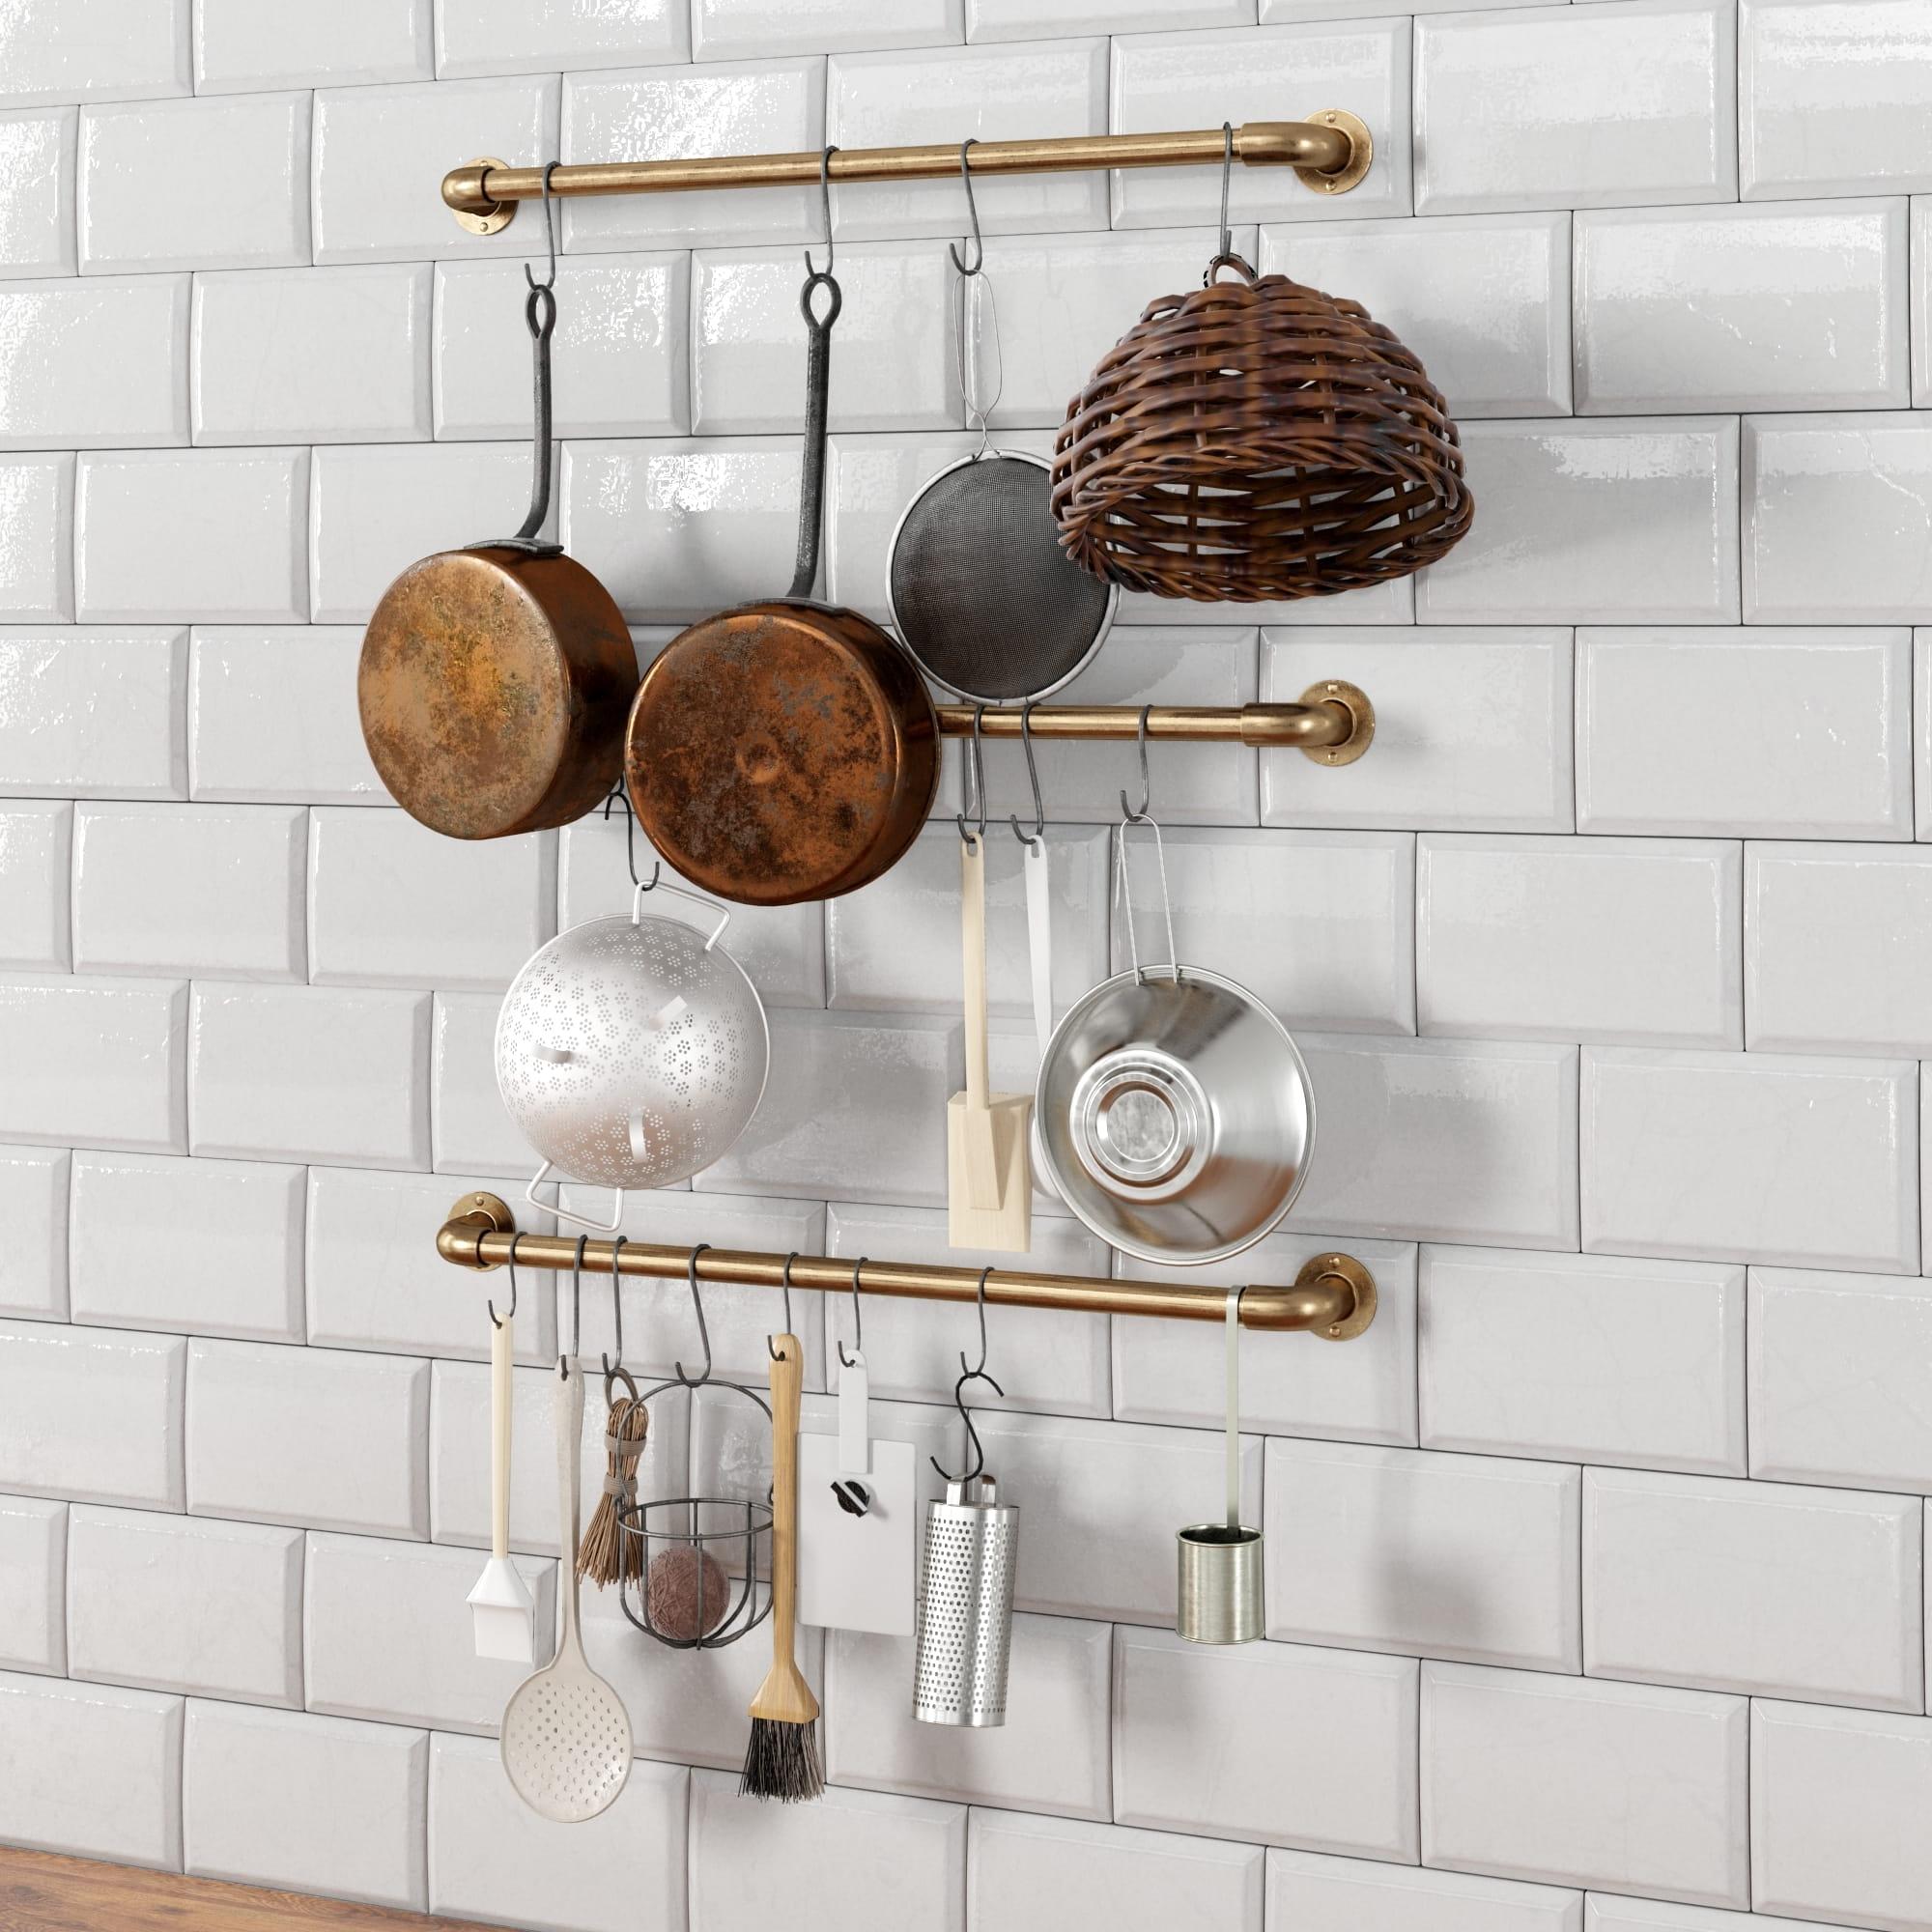 kitchen props 13 AM231 Archmodels